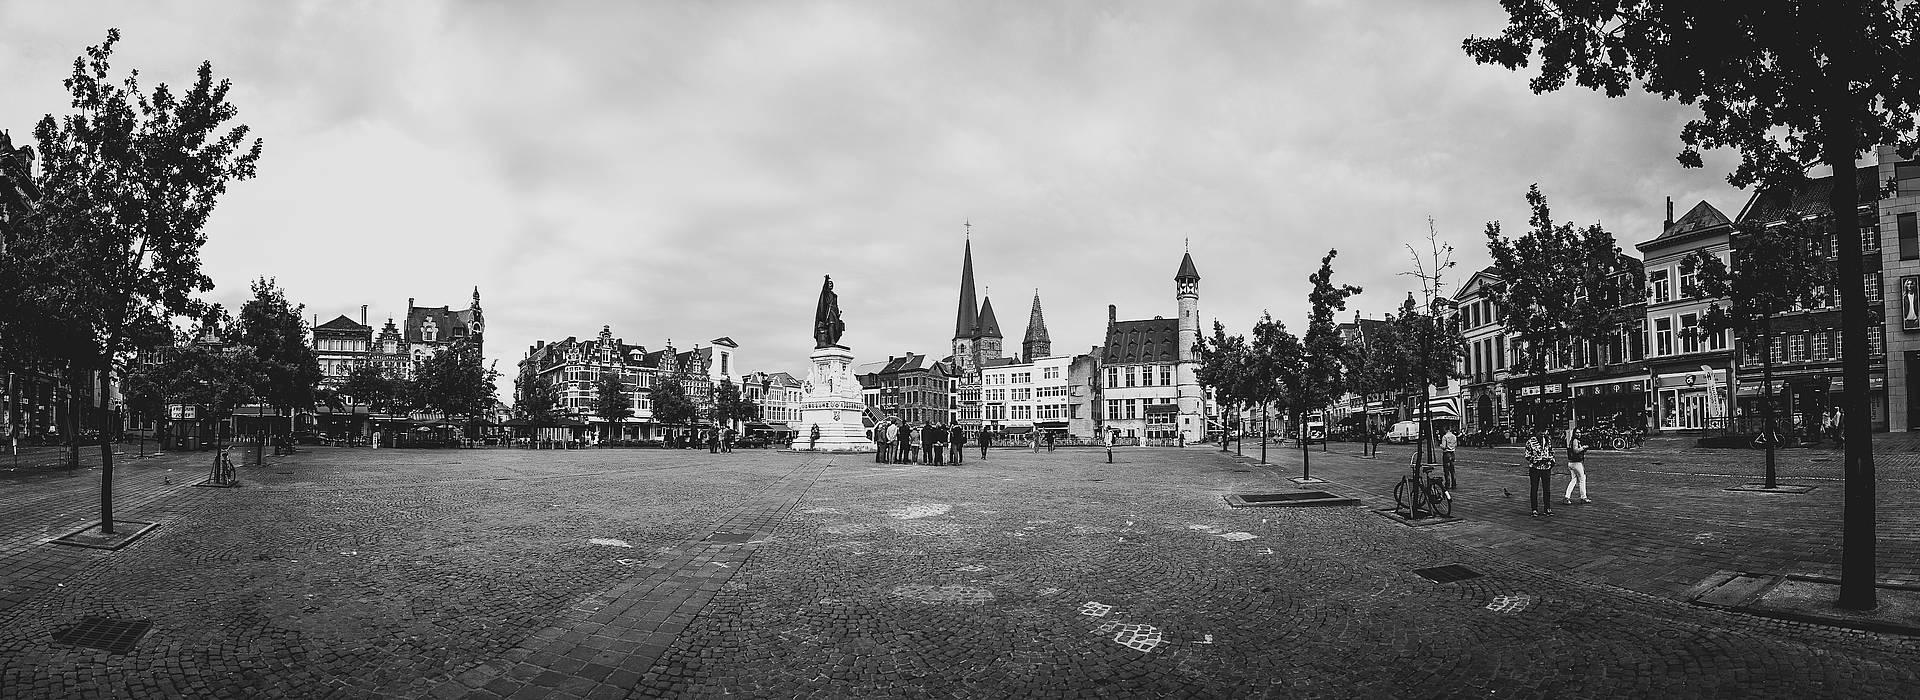 Live your Life - Descubre Gante - Vrijdagmarkt